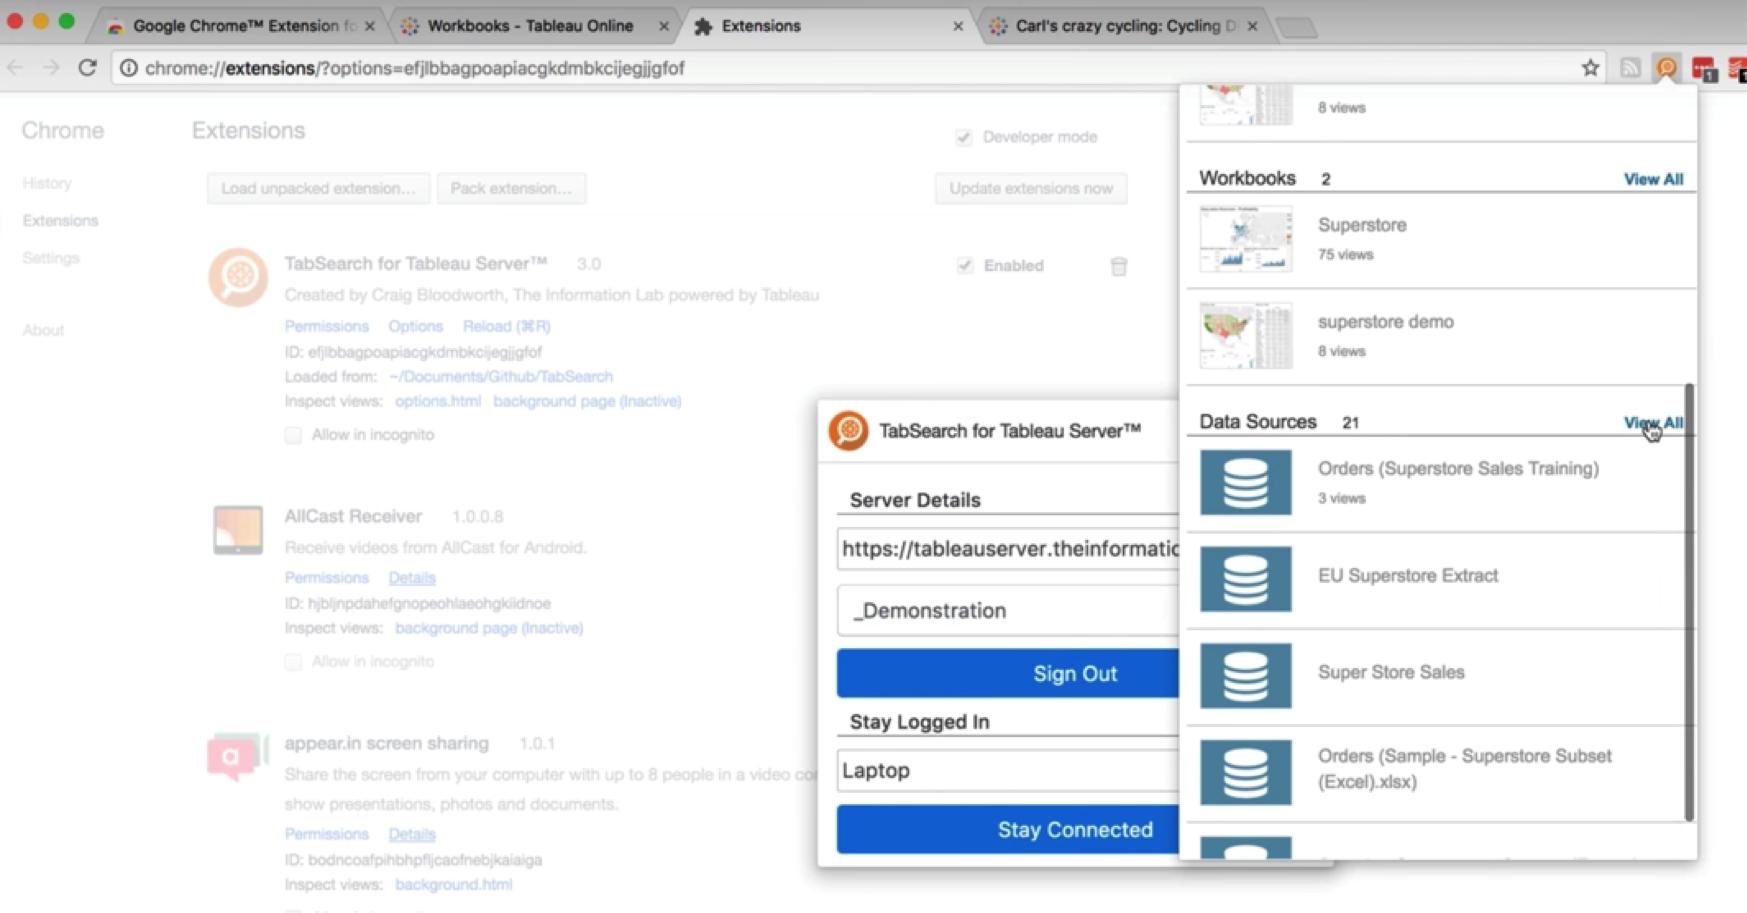 Top mashups & extensions from #DataDev hackathon | Tableau Software